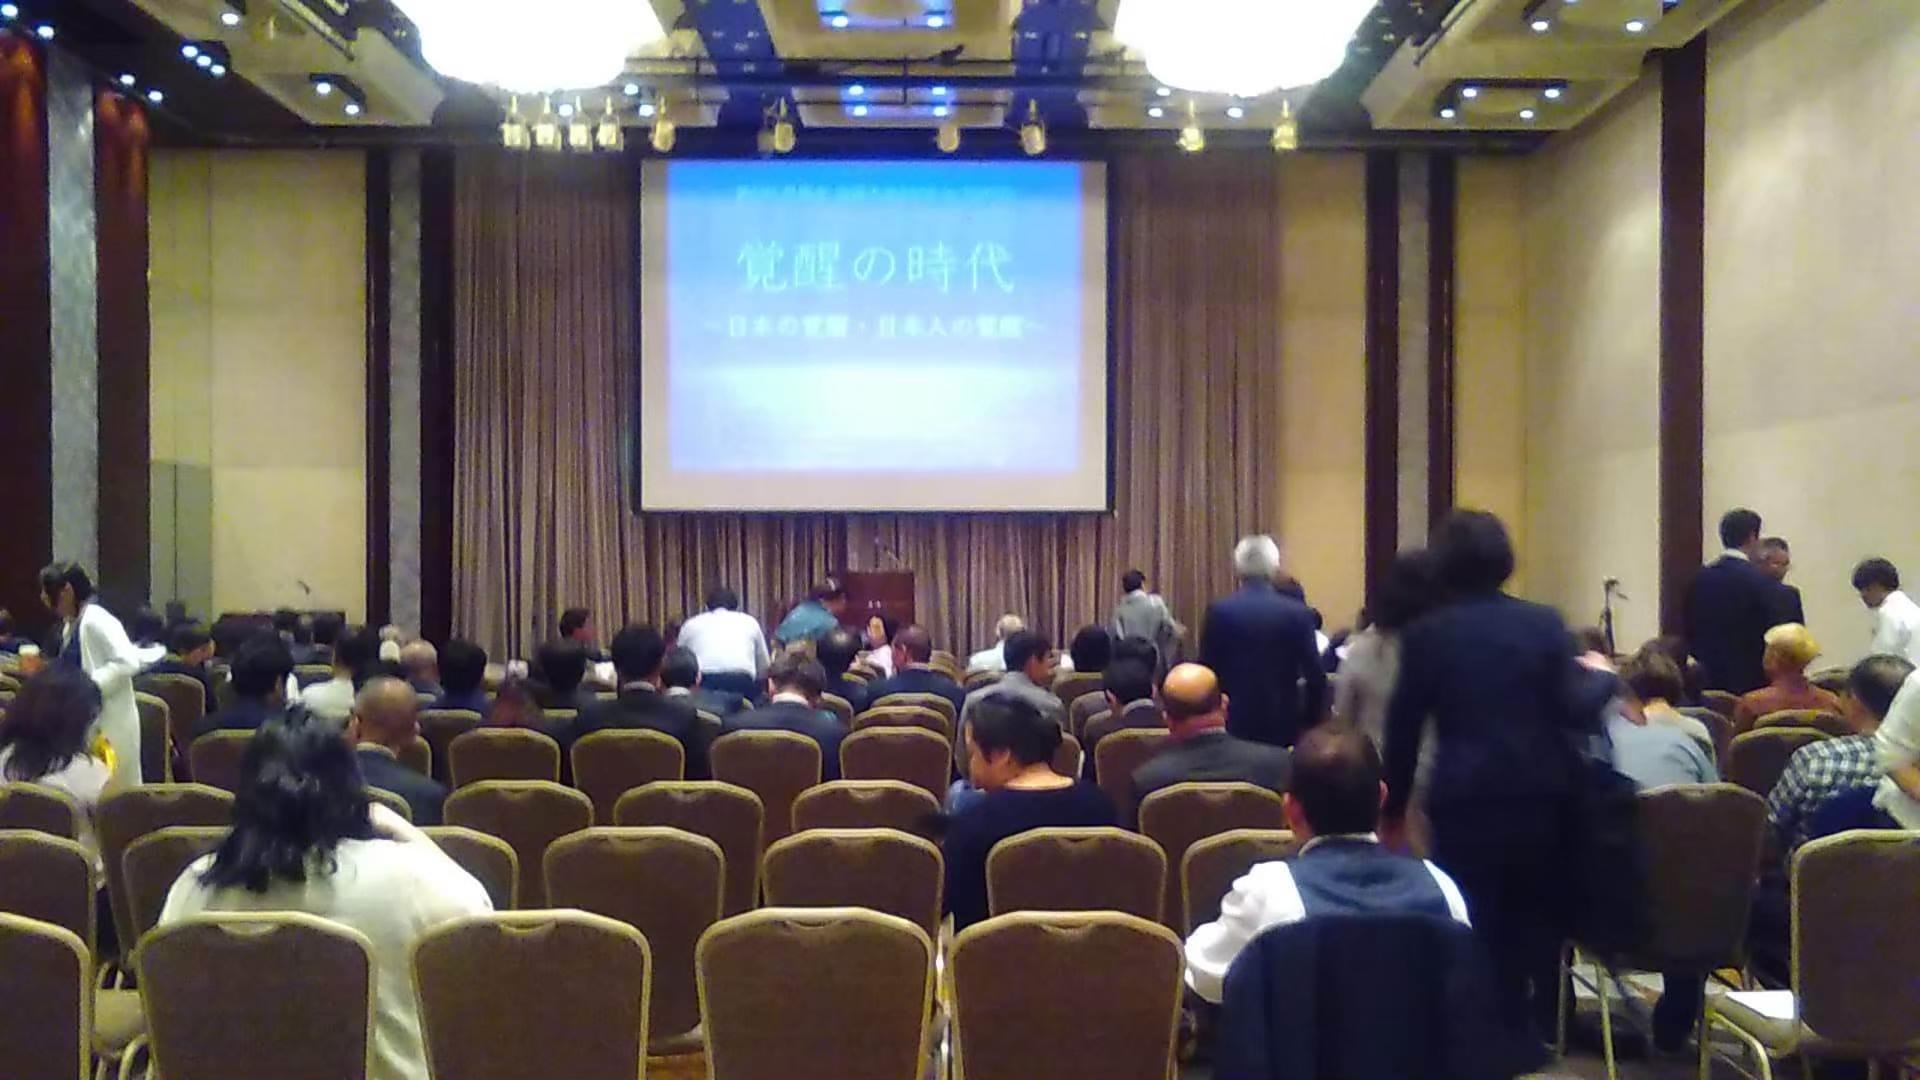 shifukaizenkoku 210602 1 - 思風会 ZOOM全国大会